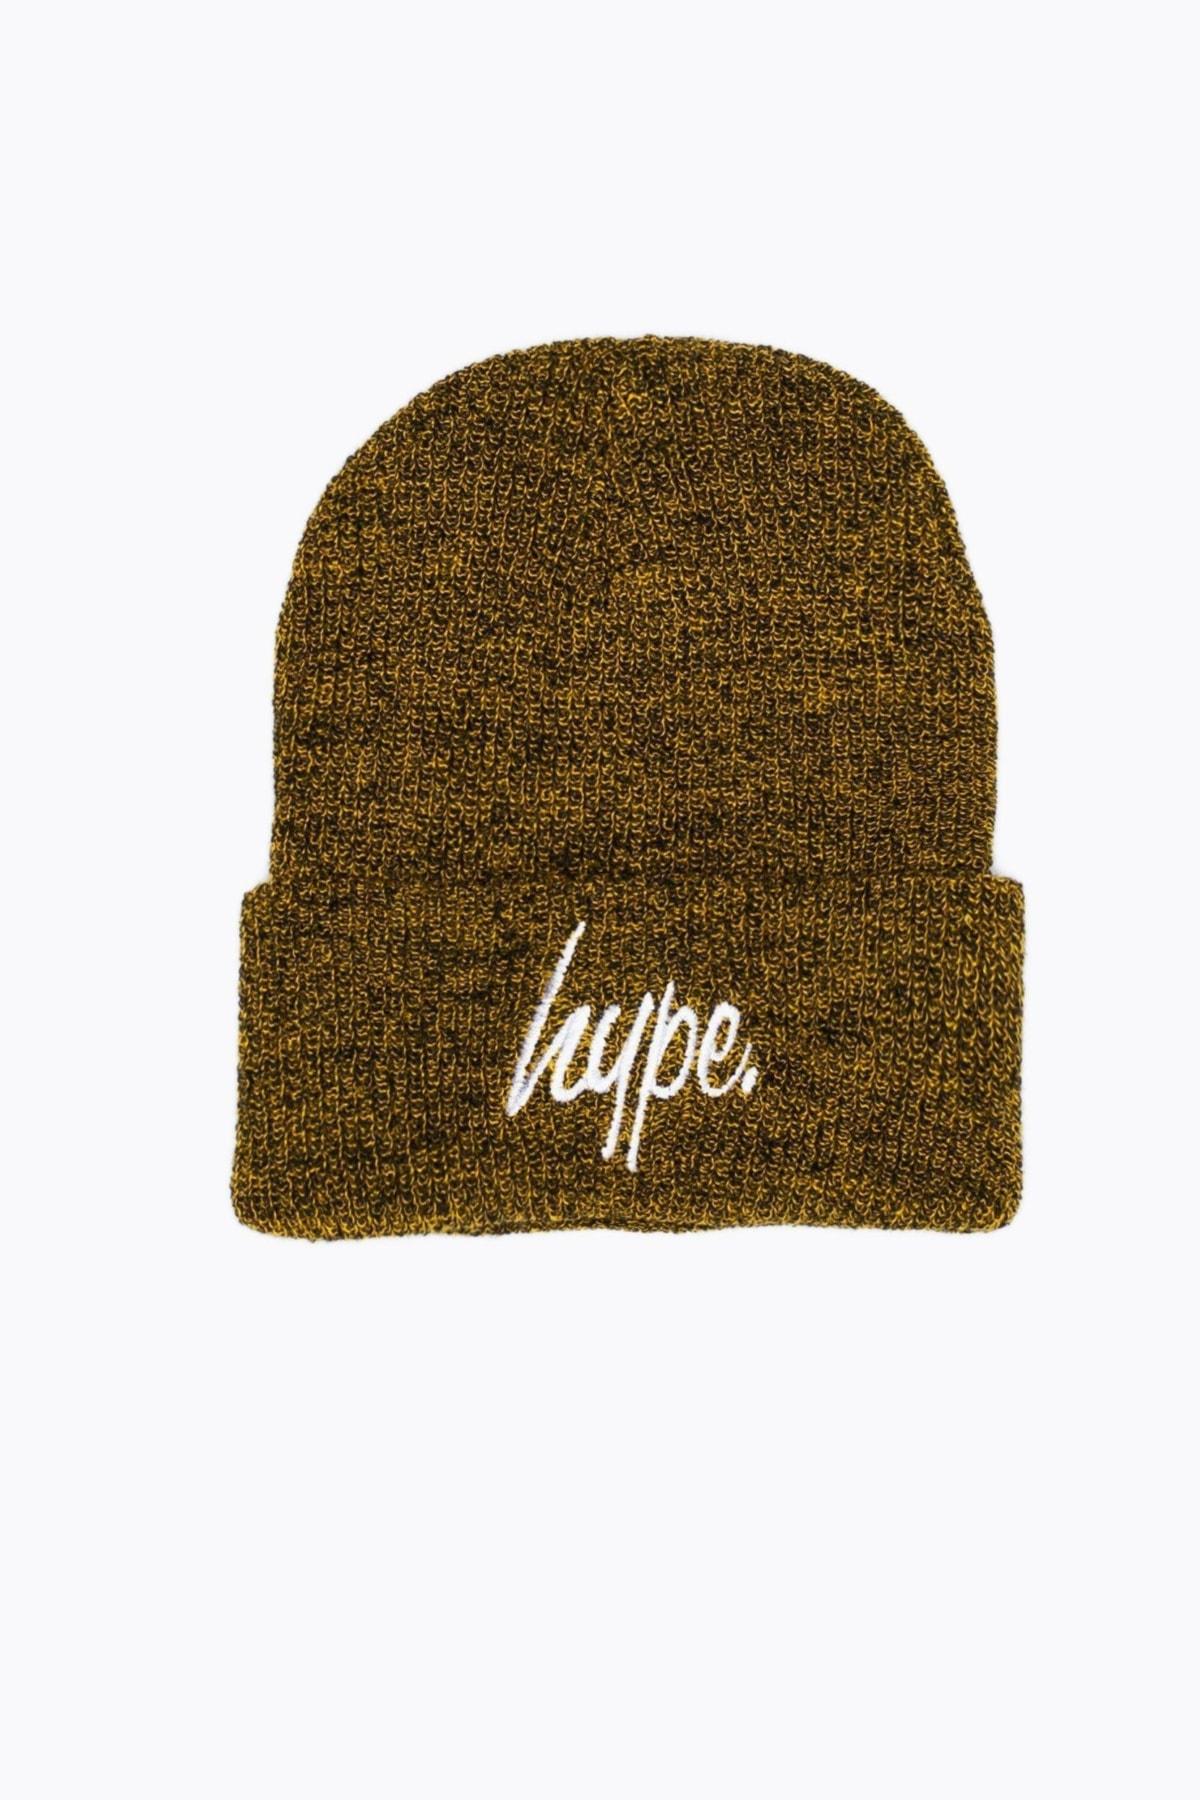 HYPE Mustard Marl/White HYPE Script Beanie